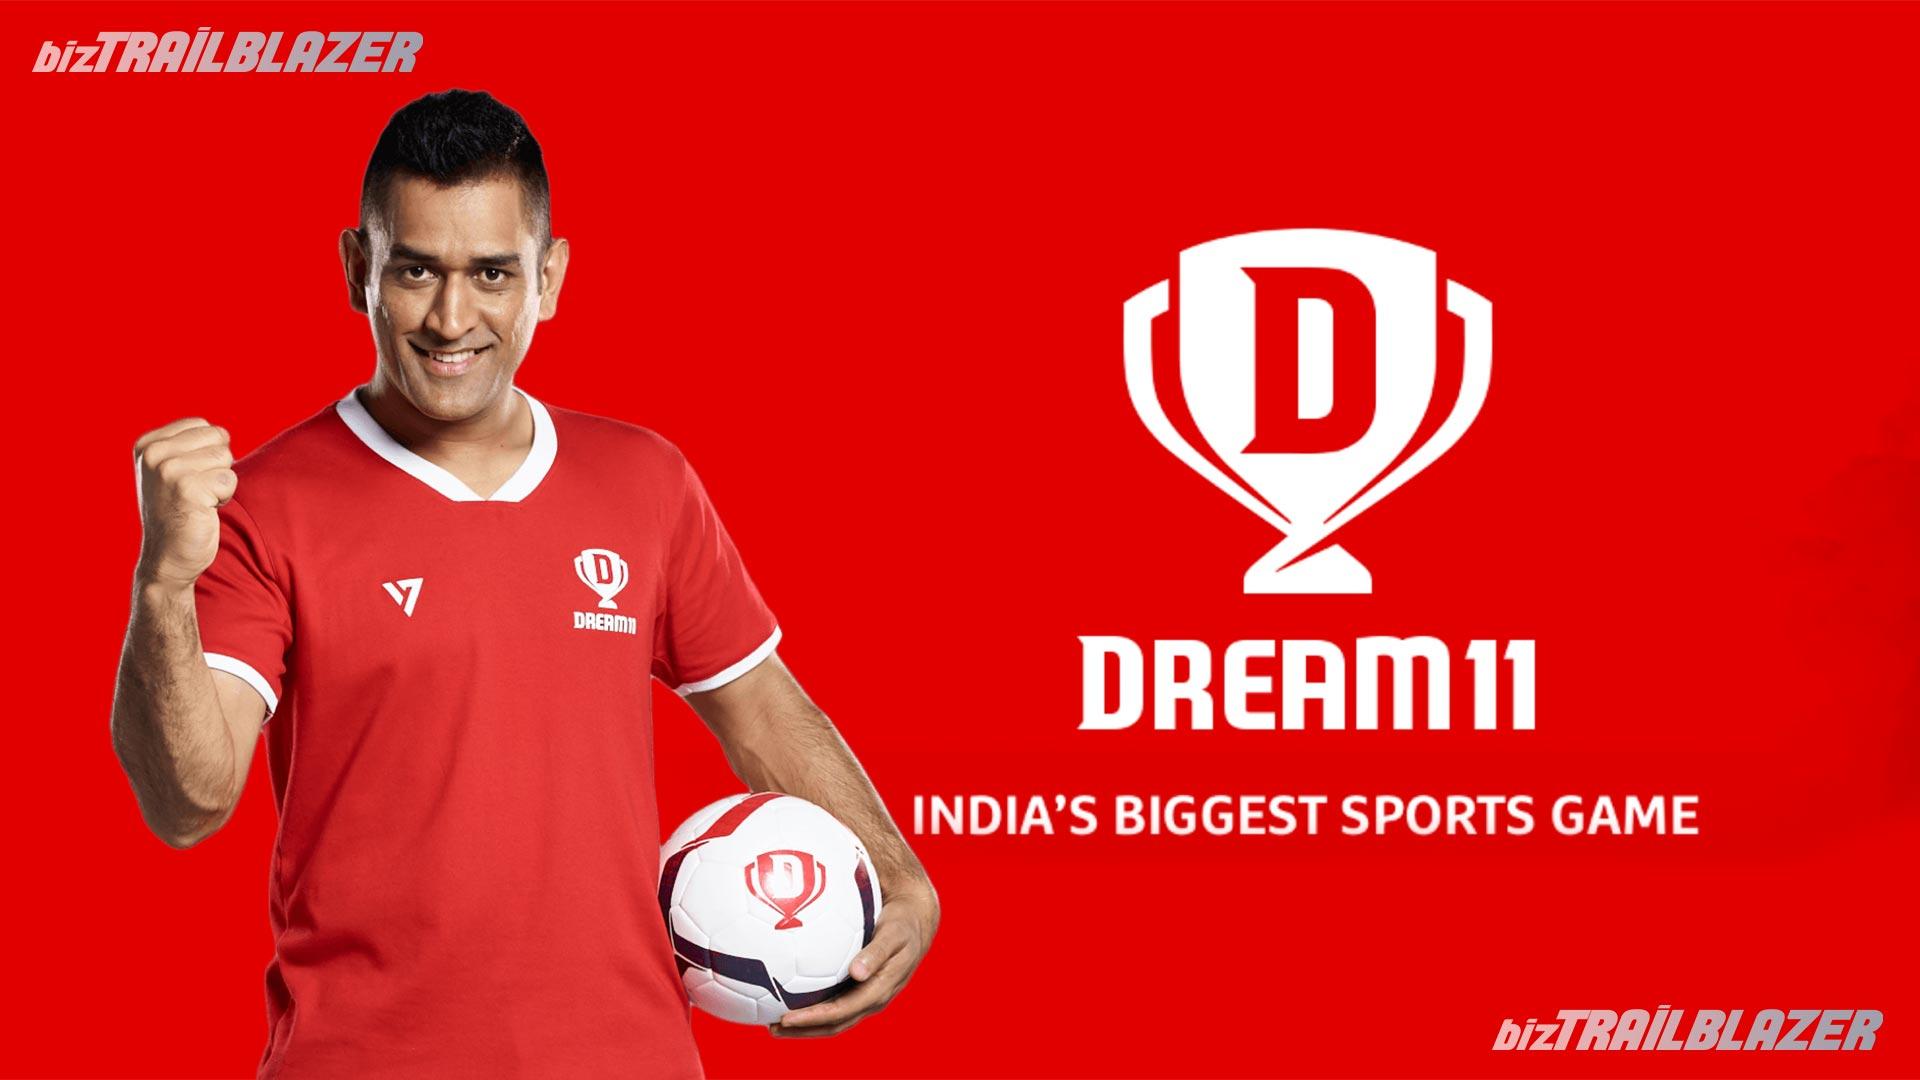 BizTrailBlazer-Blog-Dream-Sports-Raises-$225-Million-in-Latest-Funding-Round